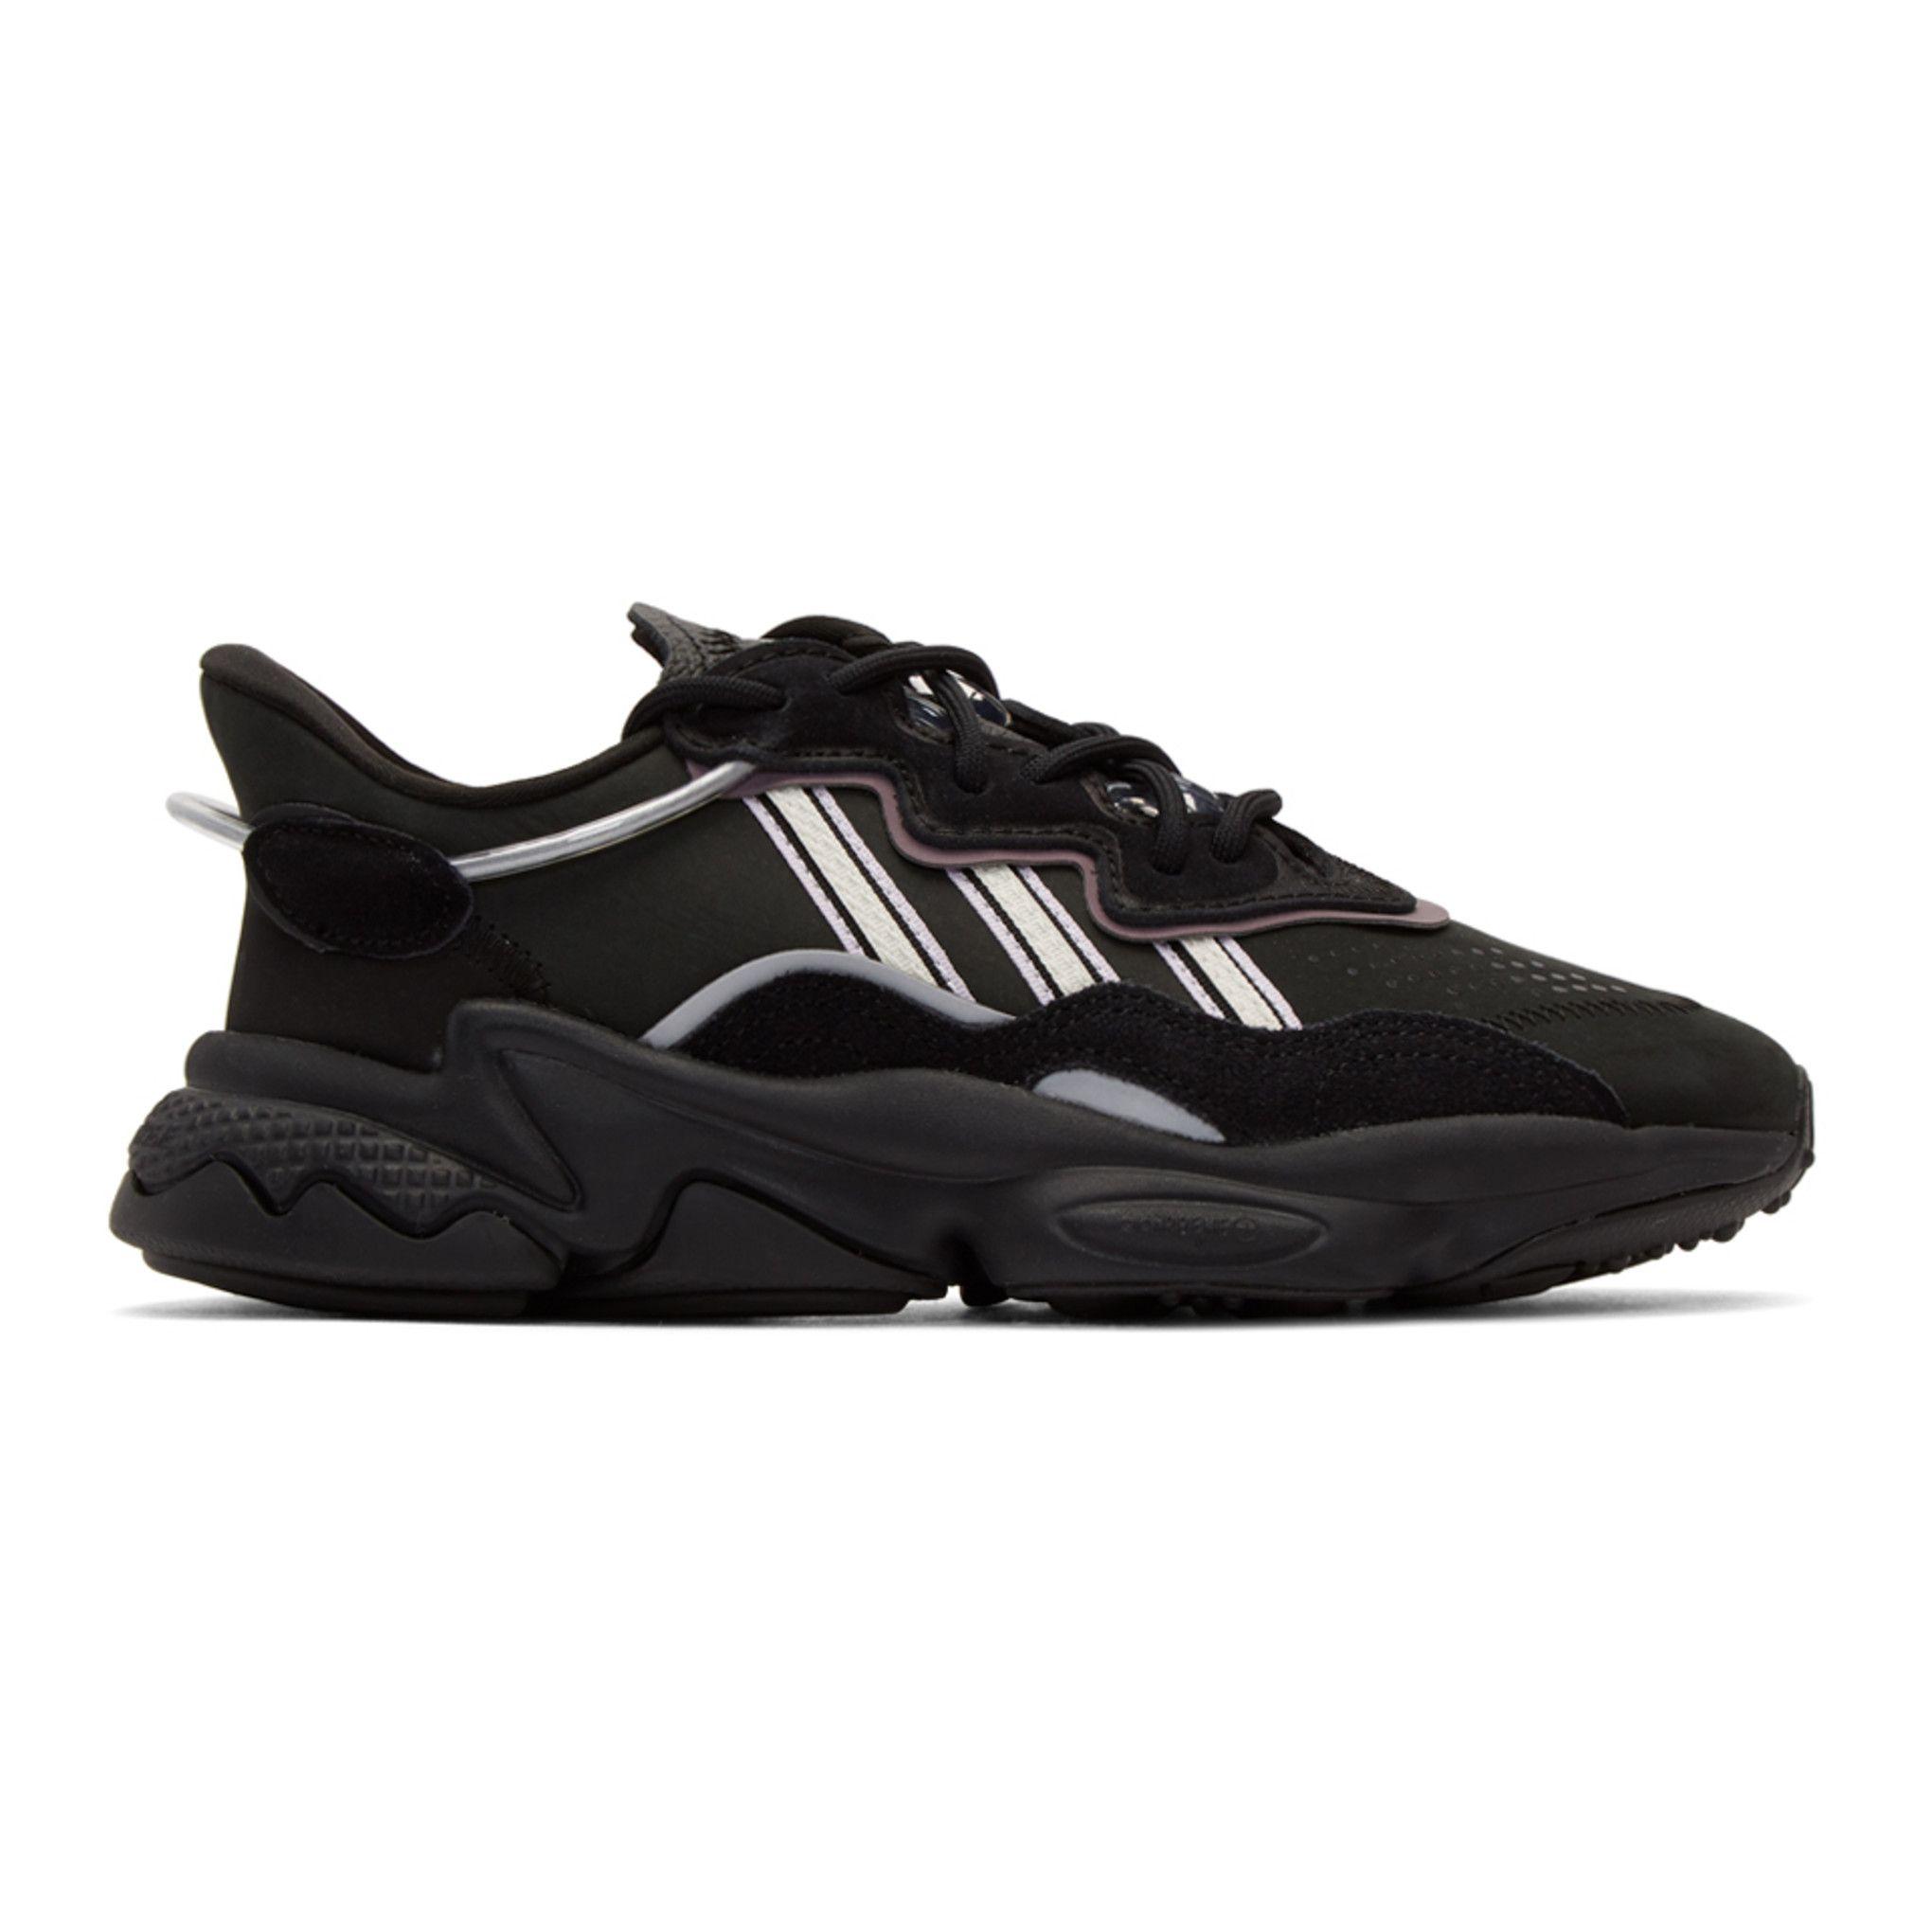 adidas Originals: Black Ozweego Sneakers | SSENSE in 2020 ...